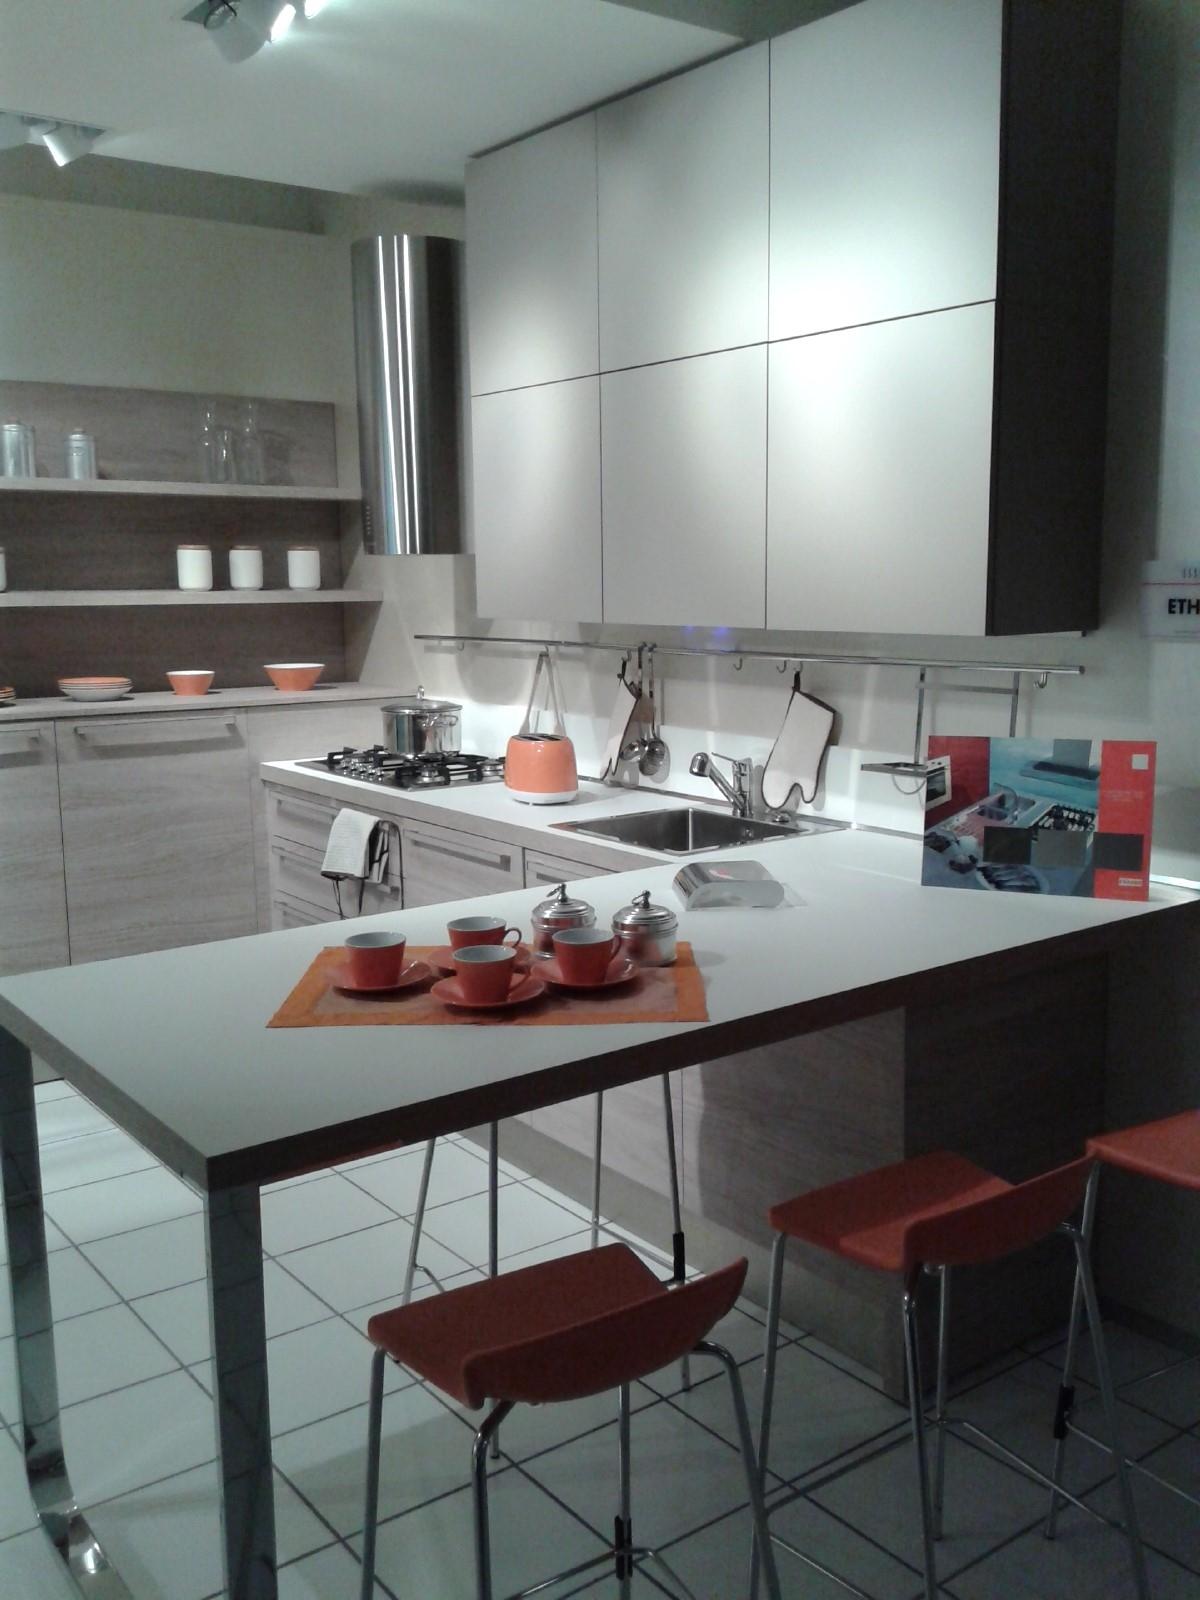 Cucina veneta cucine ethica decorativo laminato materico for Cucina veneta